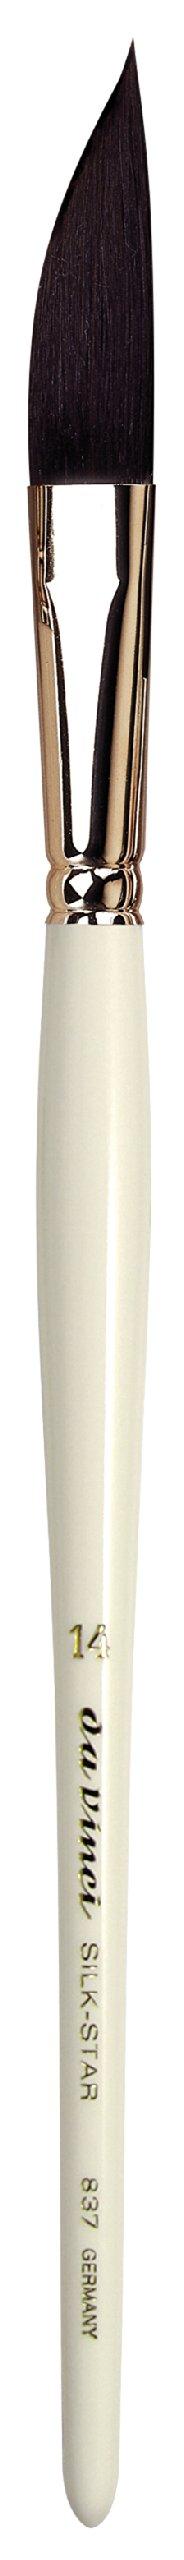 da Vinci Graphic Design Series 837 Silk Star Liner Brush, Slanting Edge Black Ox Hair with White Handle, Size 14 by da Vinci Brushes